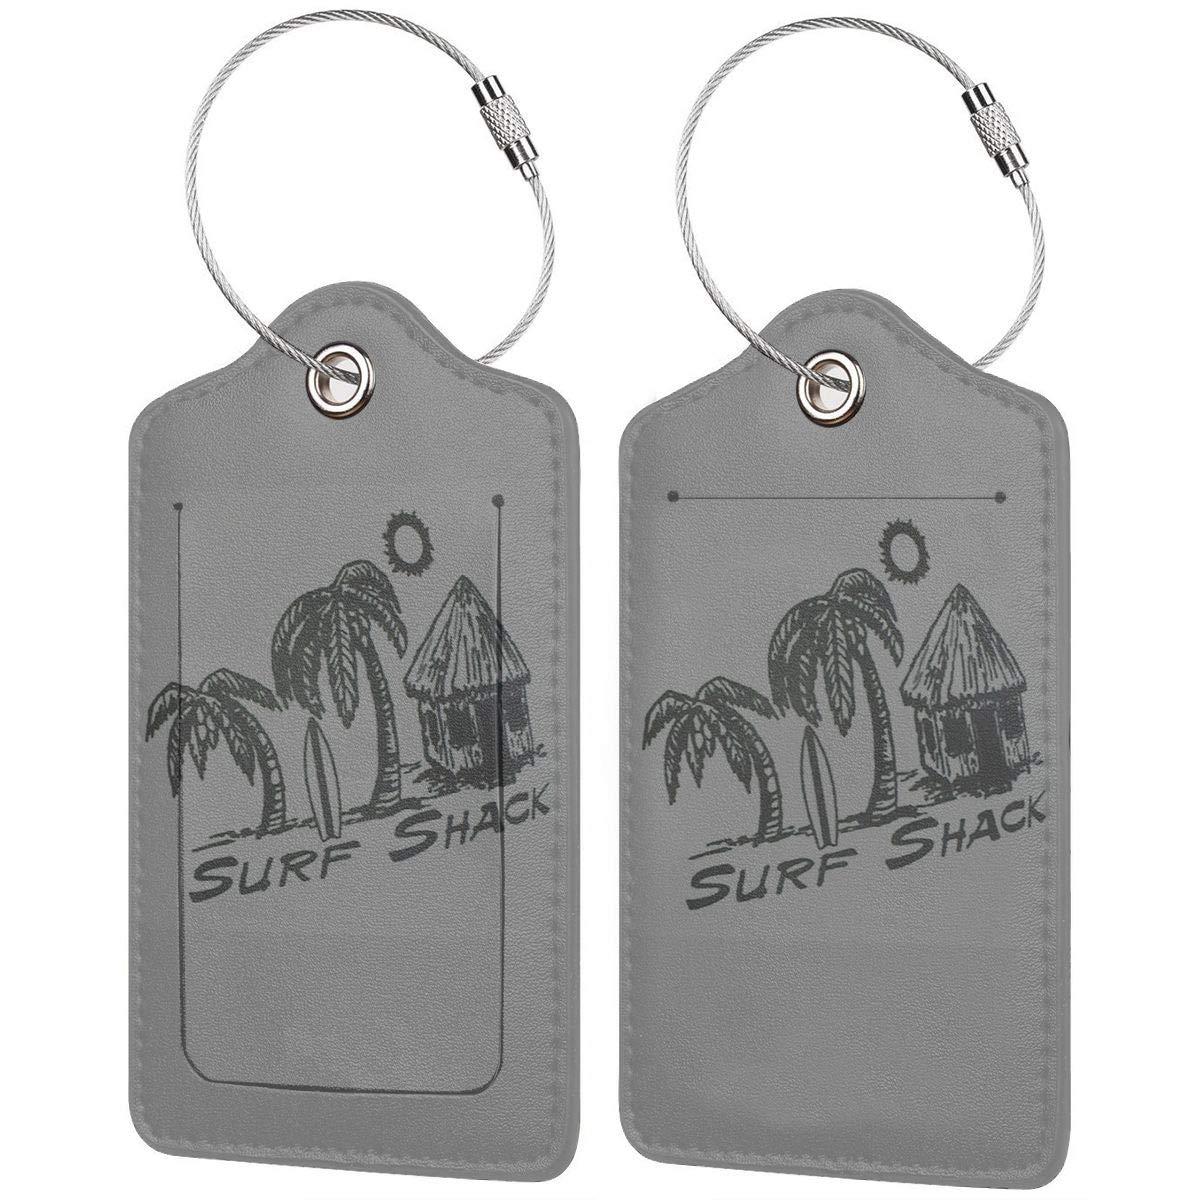 1pcs,2pcs,4pcs Surf Shack Pu Leather Double Sides Print Luggage Tag Mutilple Packs